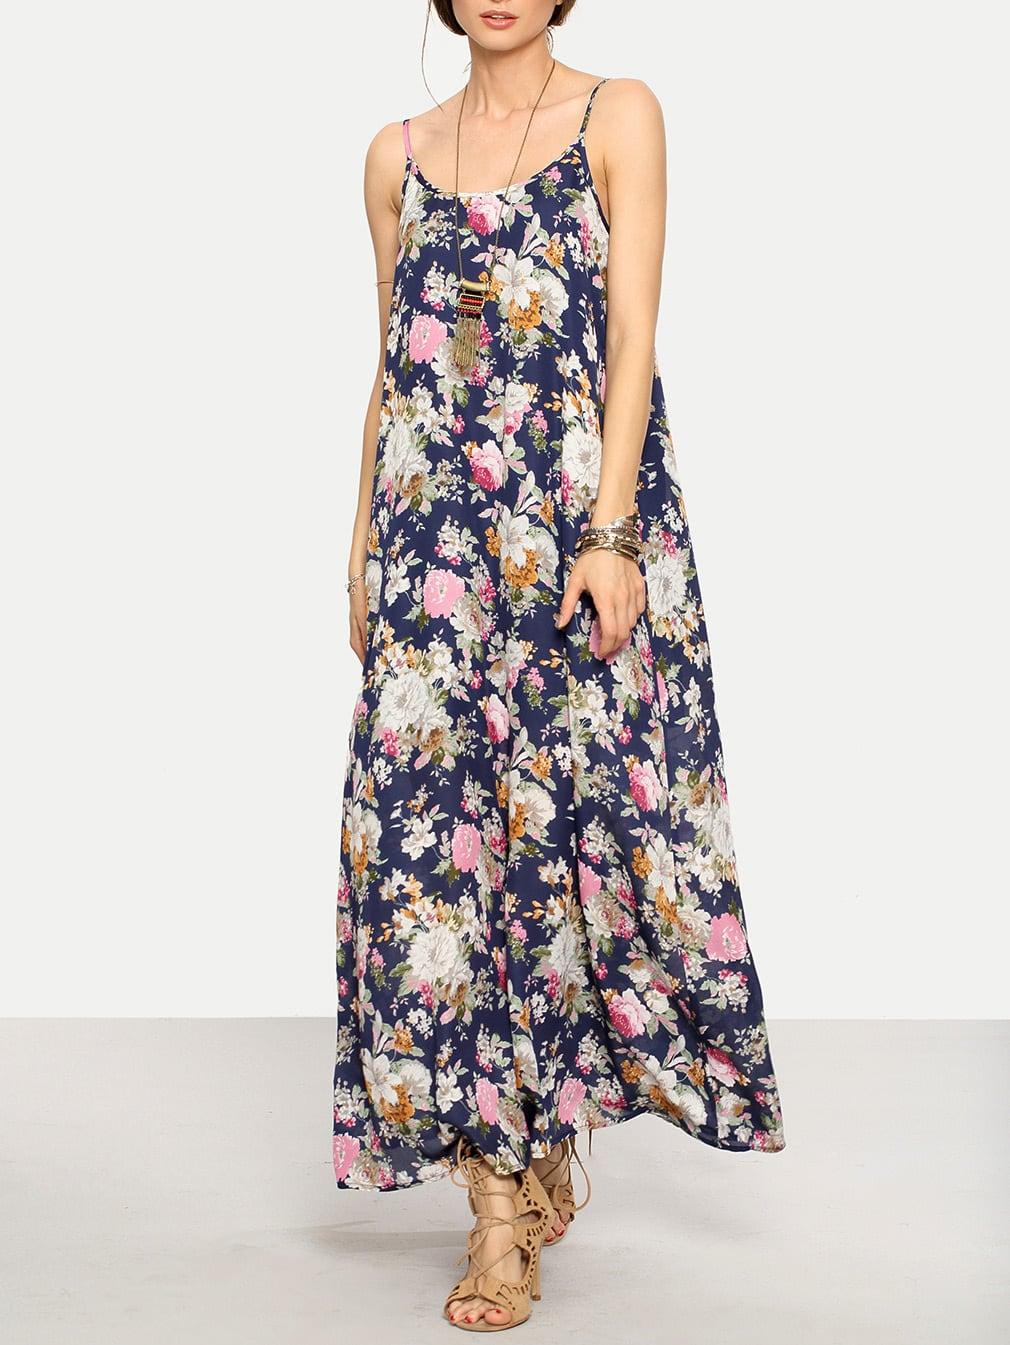 Cami Straps Floral Print Maxi Dress